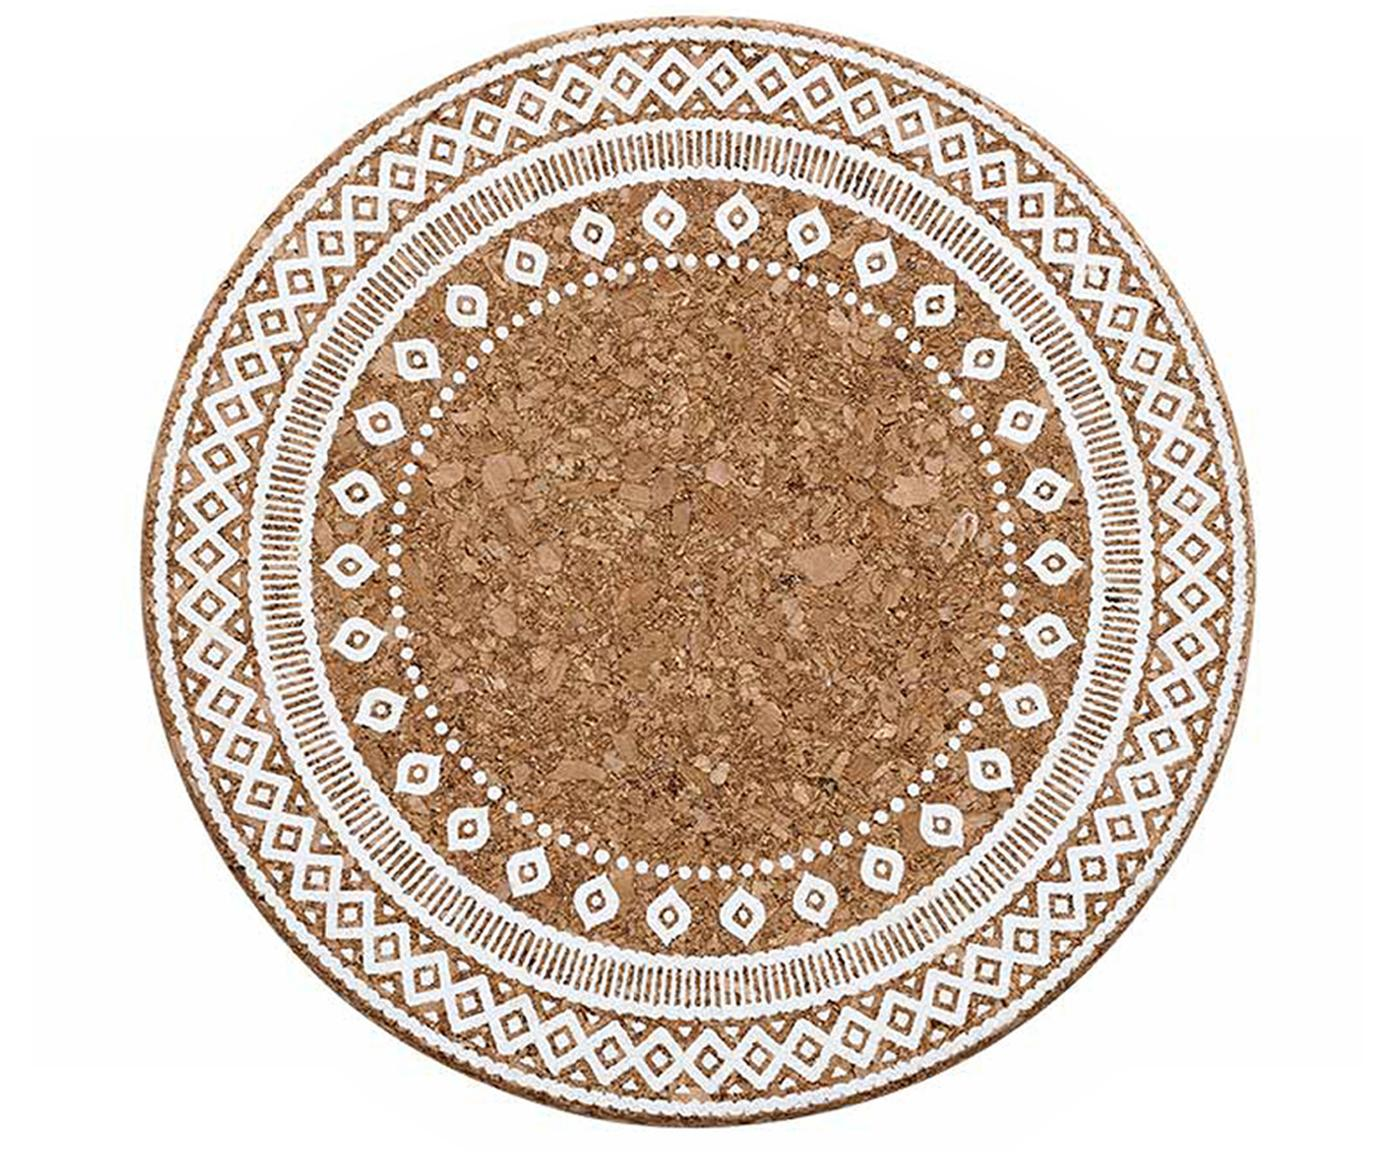 Gemusterte Kork-Topfuntersetzer Oasis, 2 Stück, Kork, Weiß, Kork, Ø 20 x H 2 cm